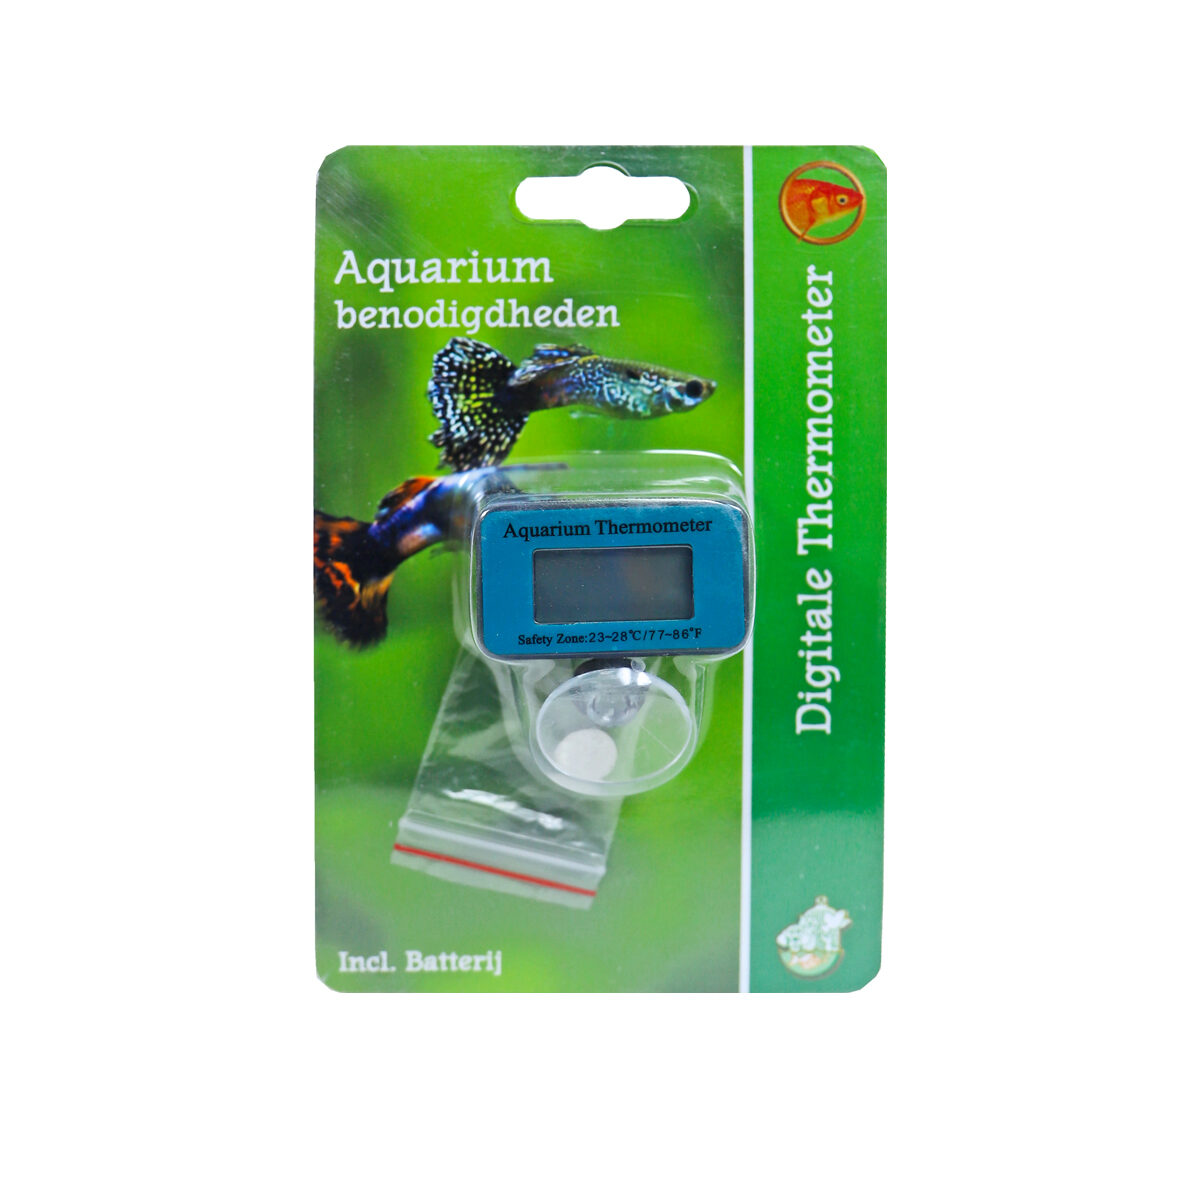 Digitale Thermometer Inclusief Batterij